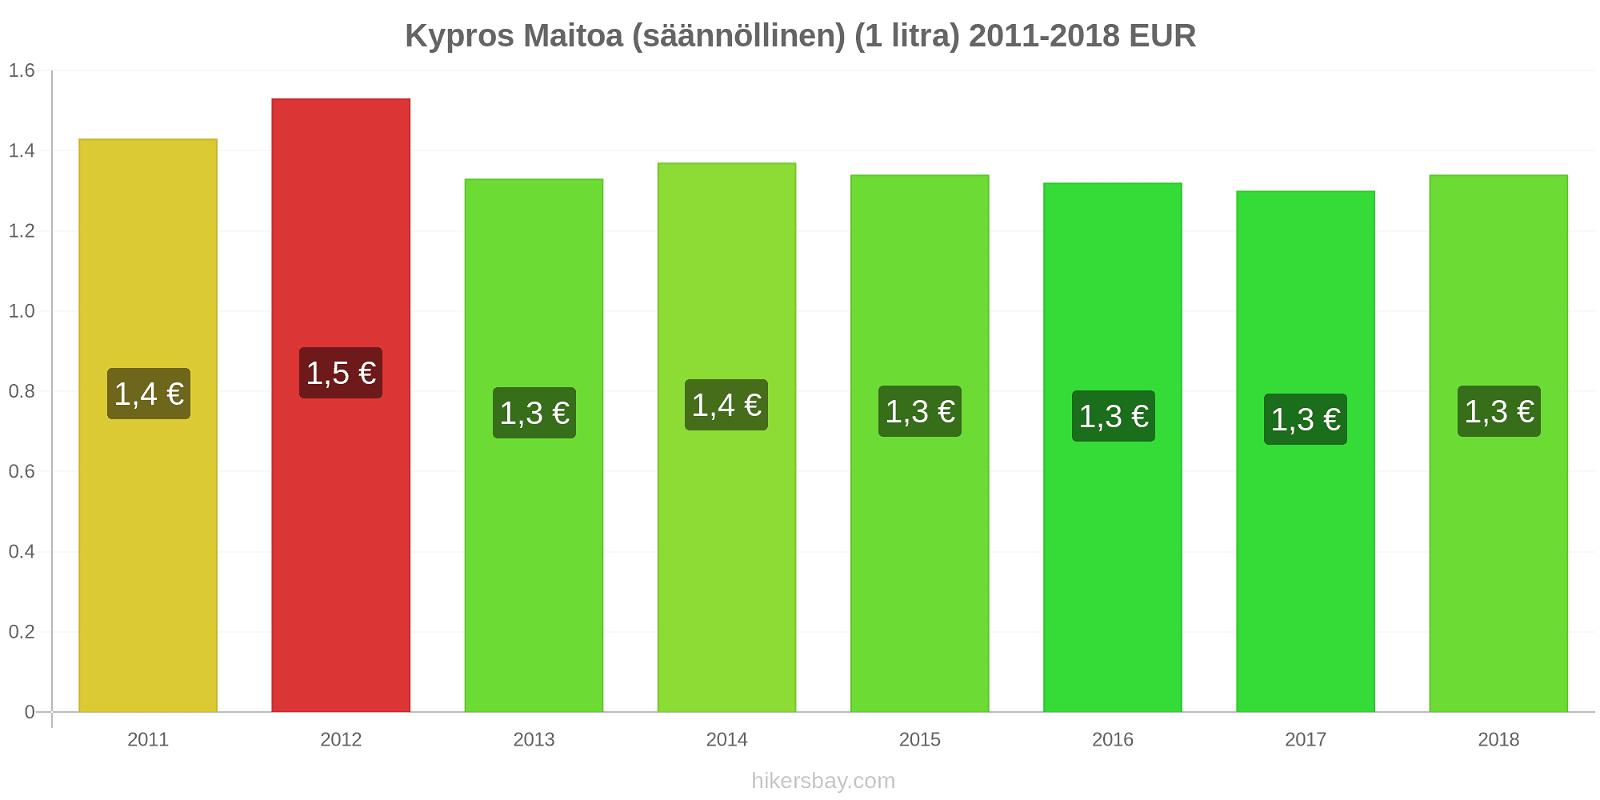 Kypros hintojen muutokset Maitoa (säännöllinen) (1 litra) hikersbay.com